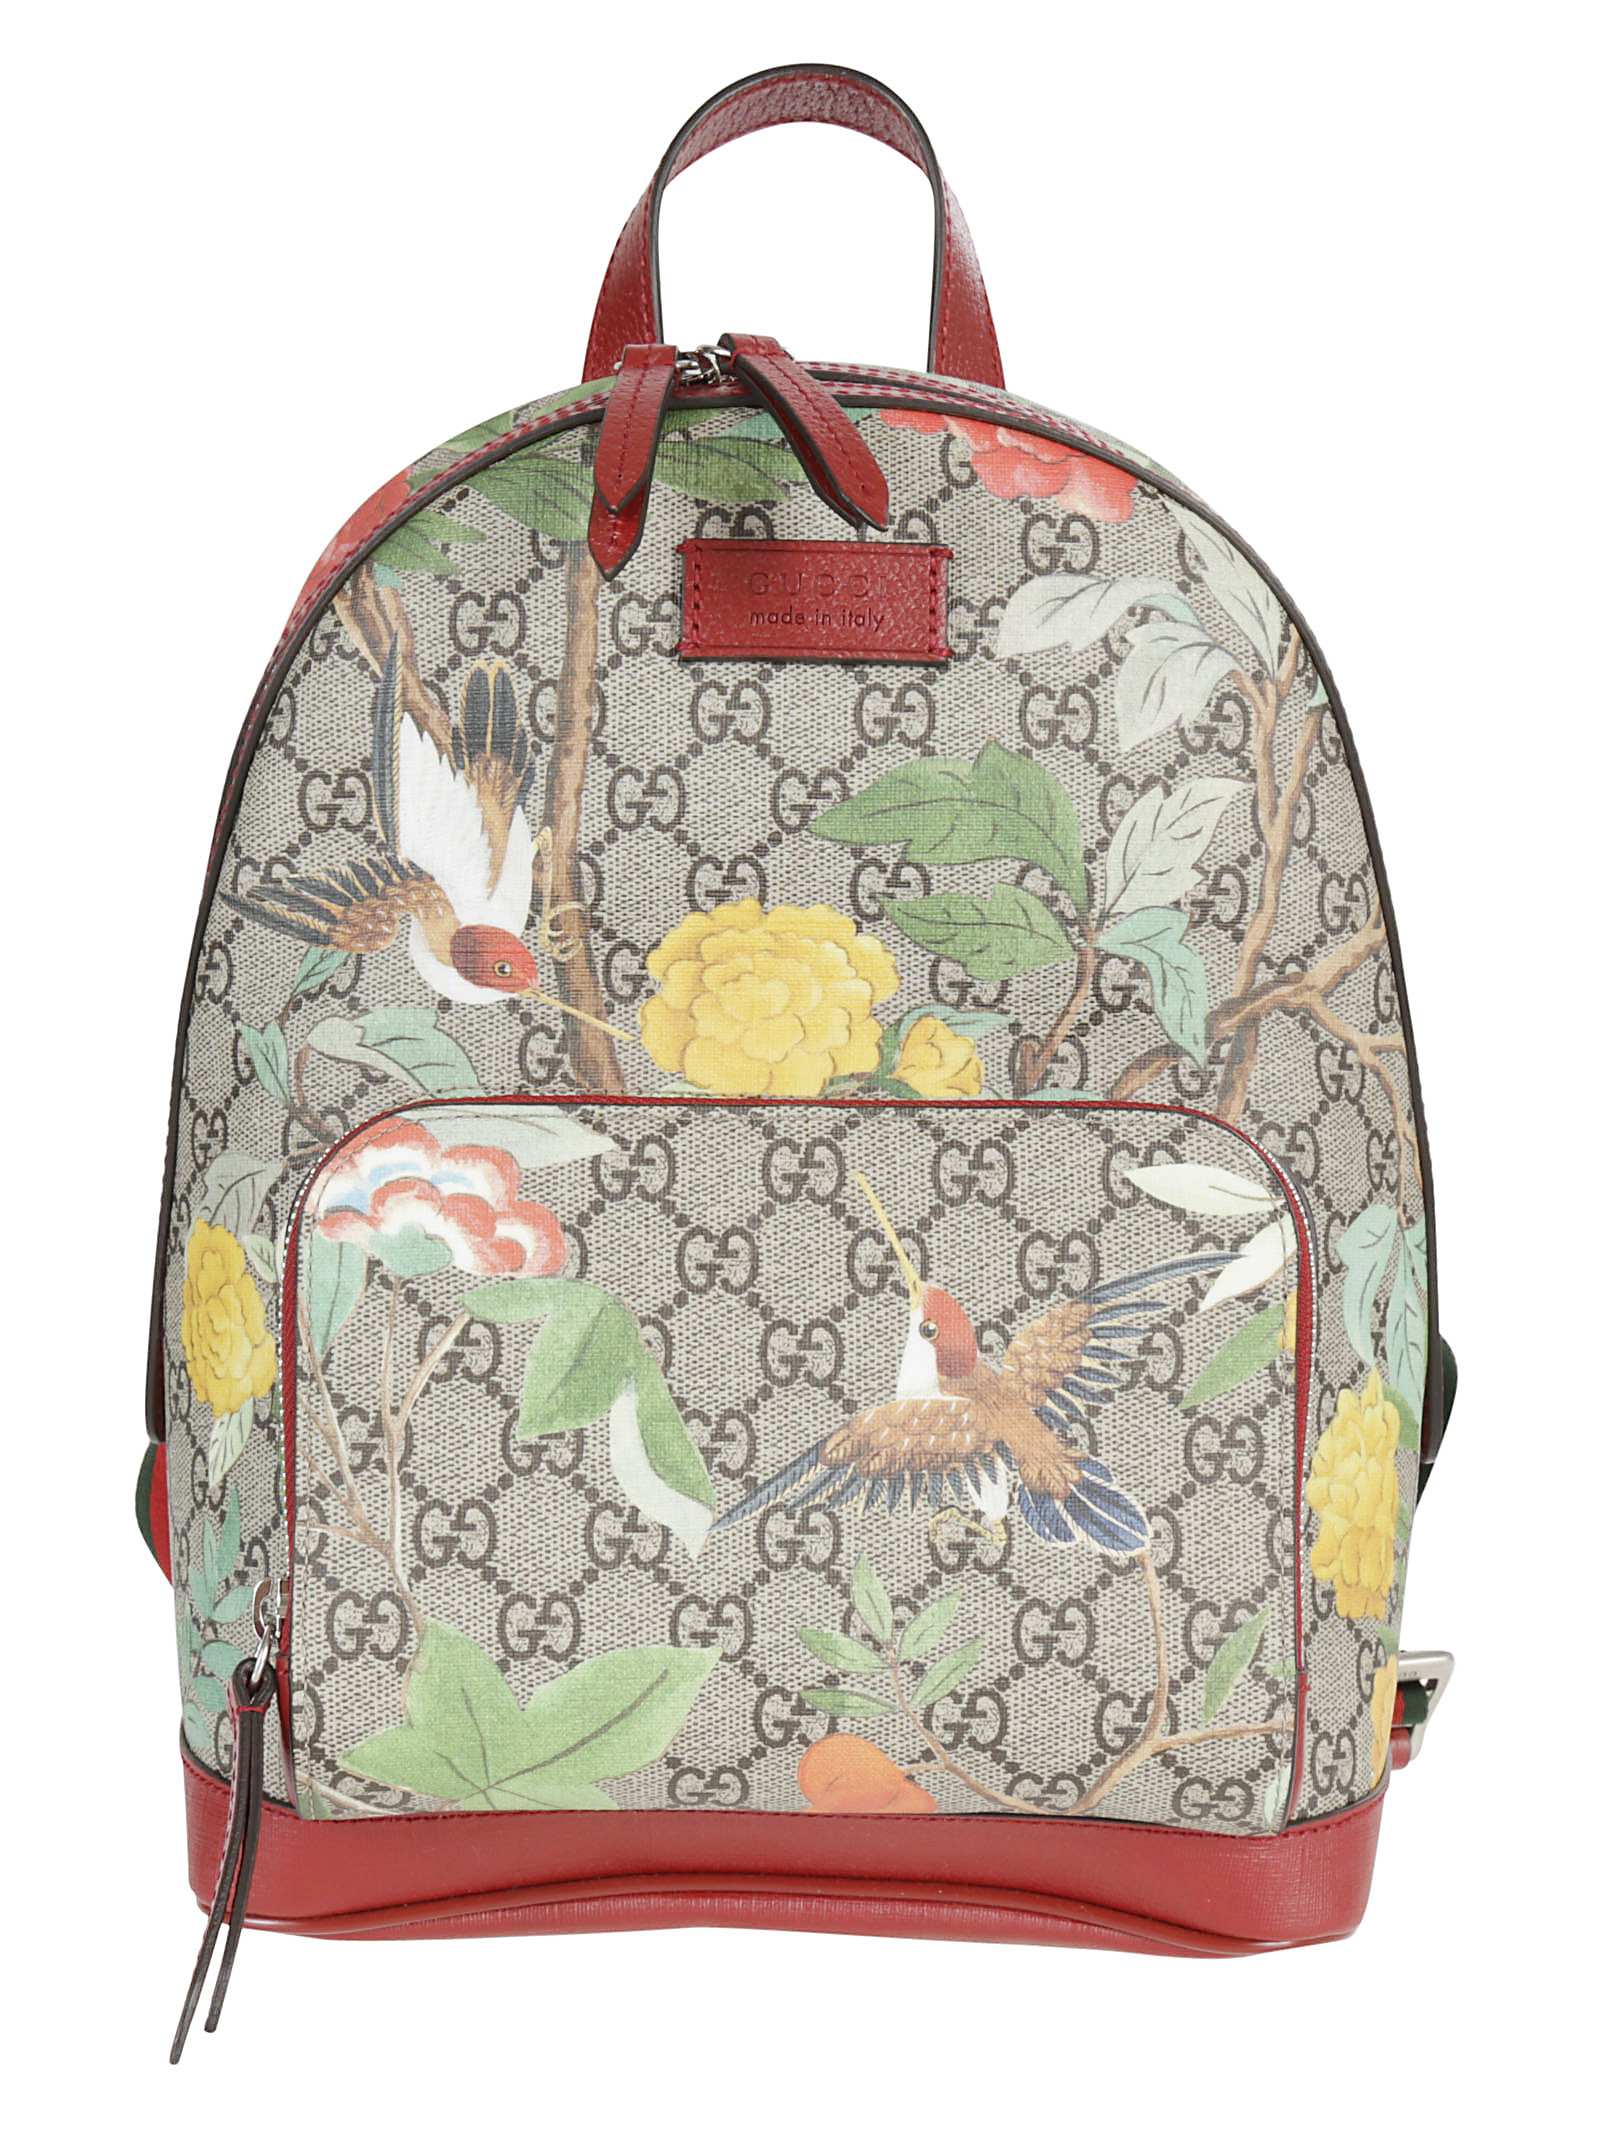 6e5afe38aeb Gucci Gucci Tian GG Supreme Backpack - Beige - 692213   italist